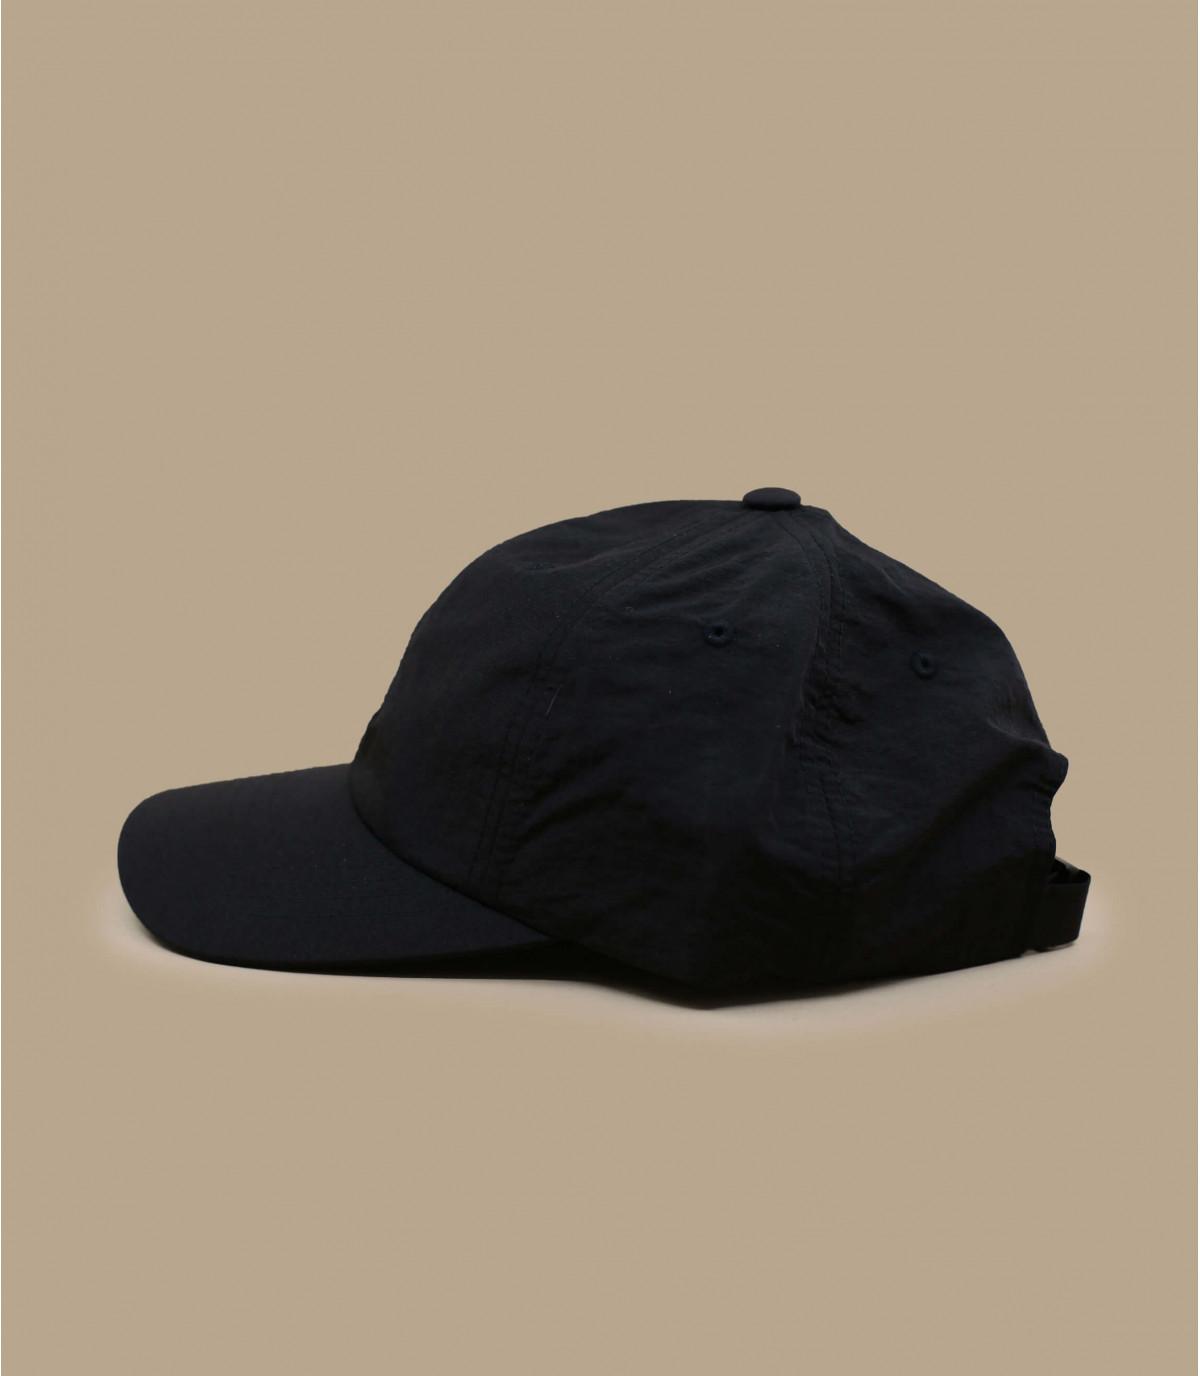 Black Kangol cap